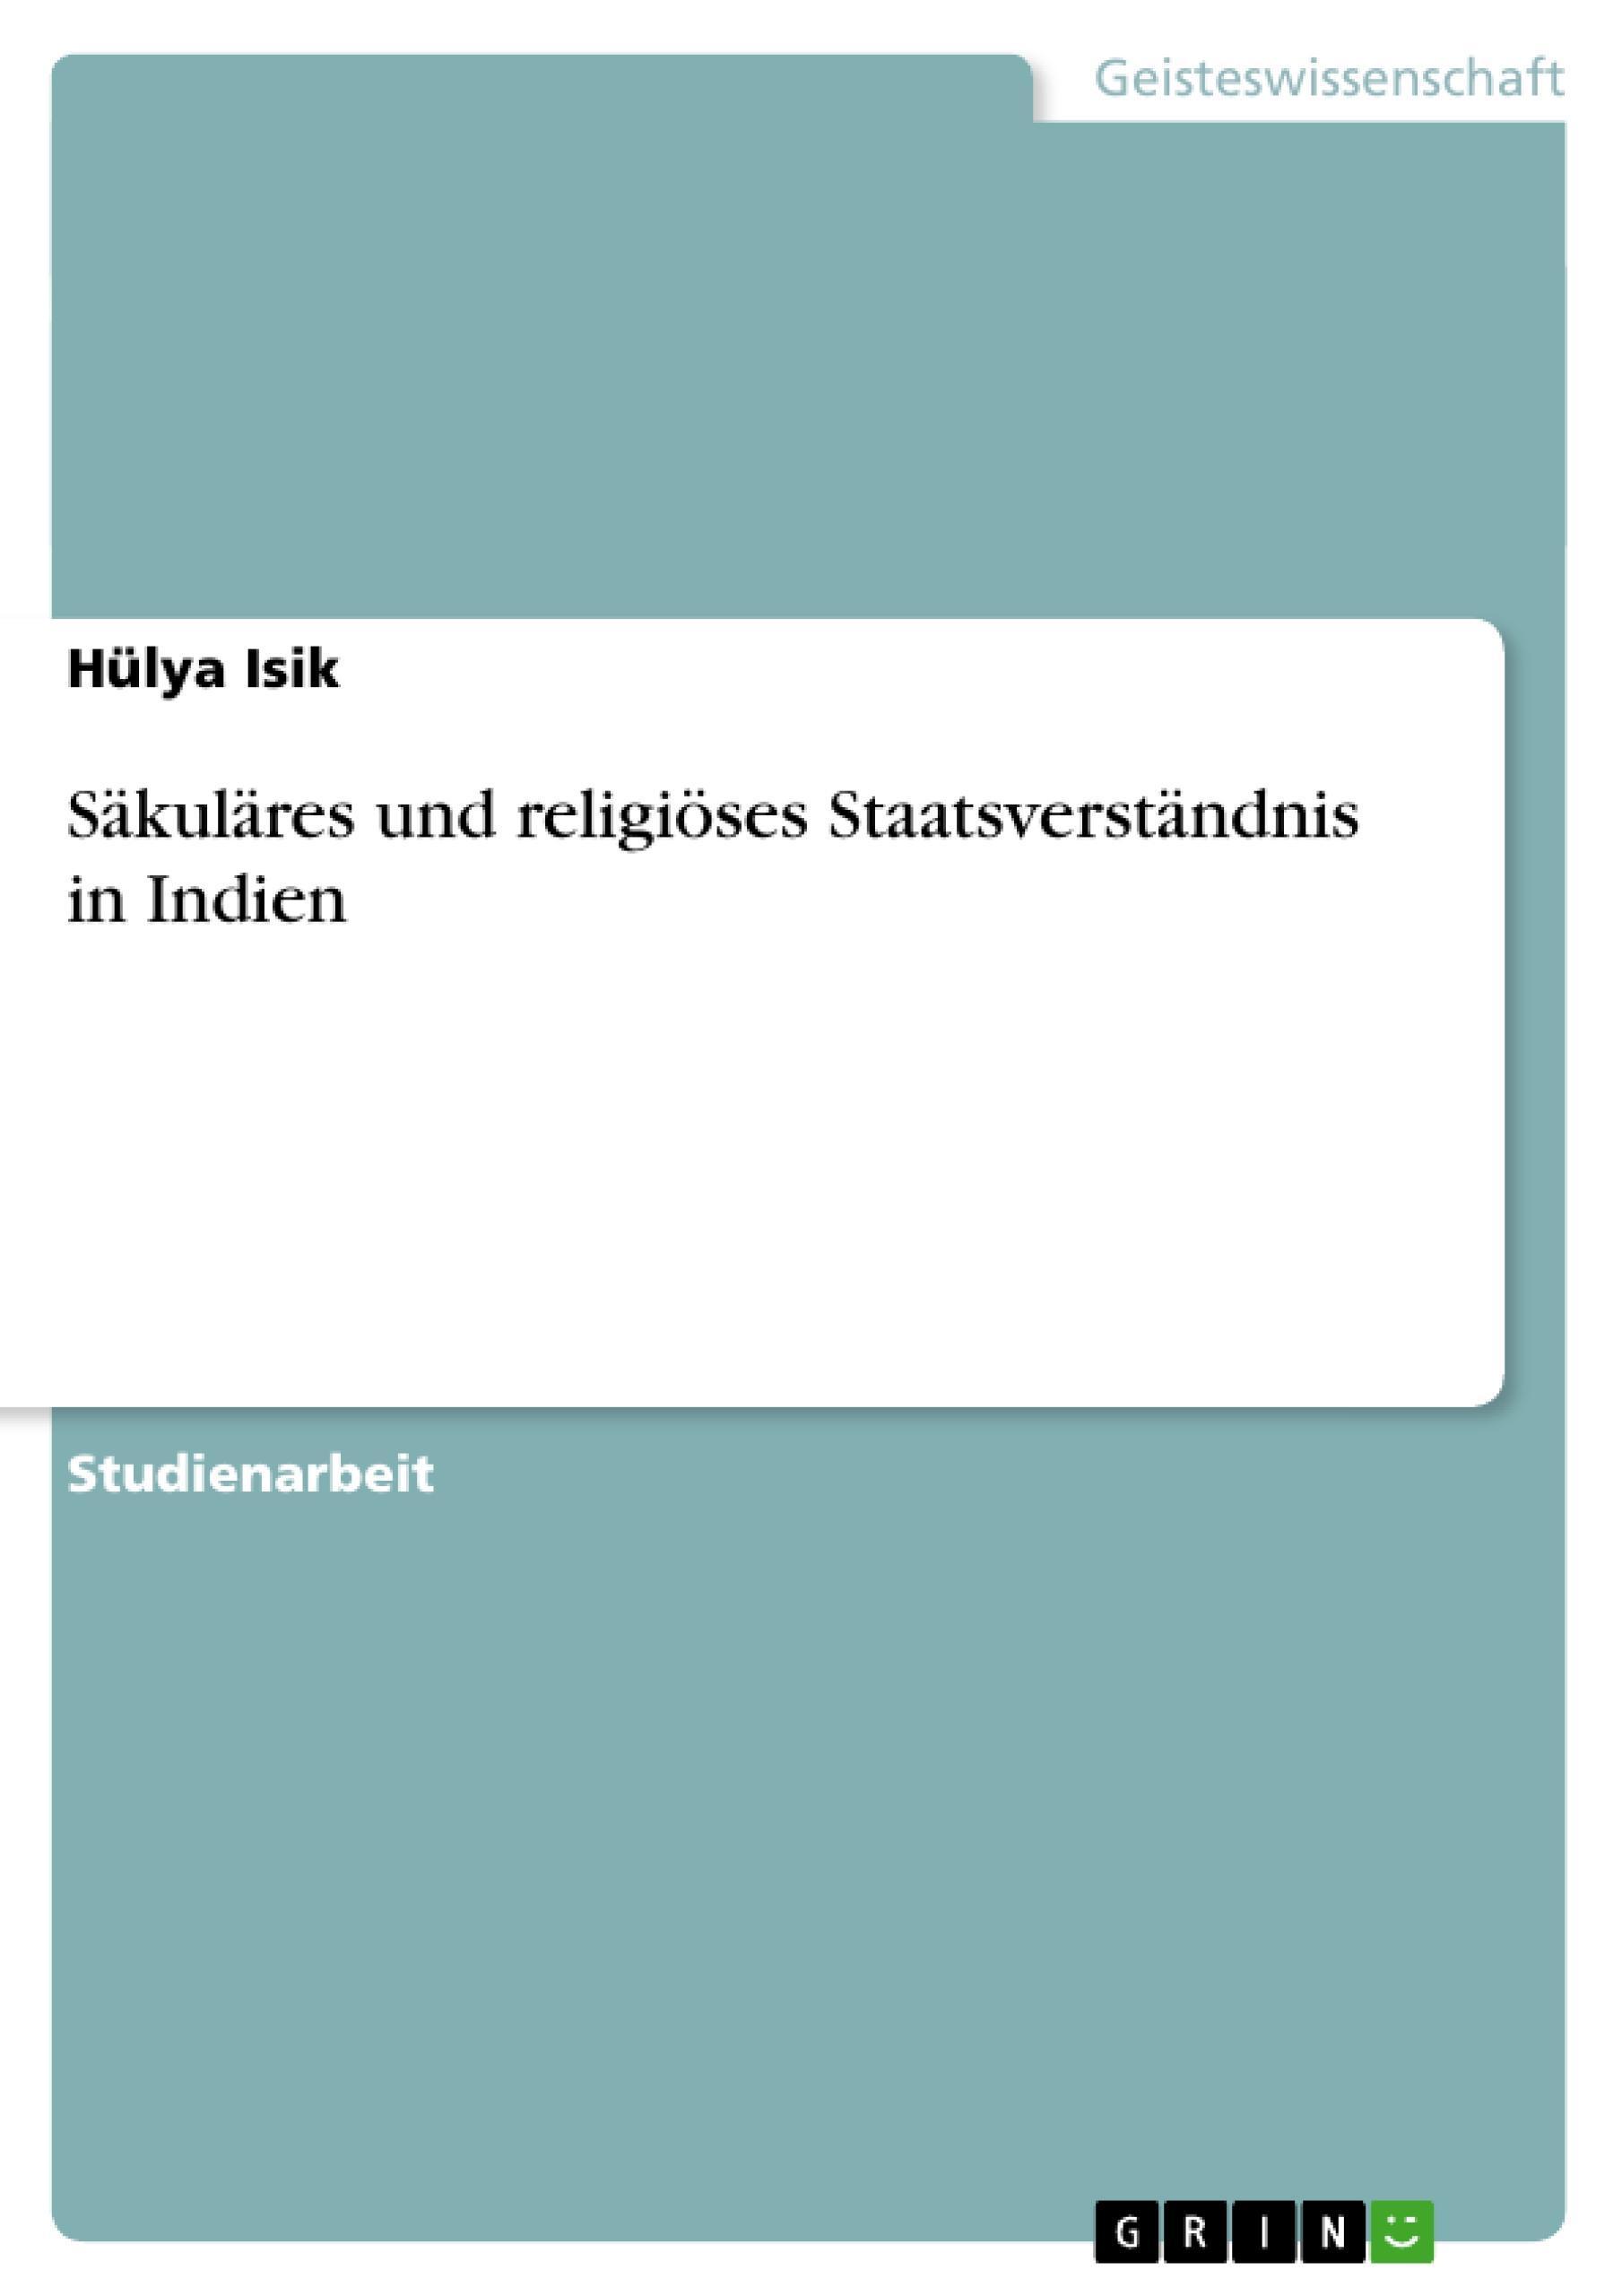 Säkuläres und religiöses Staatsverständnis in Indien Hülya Isik